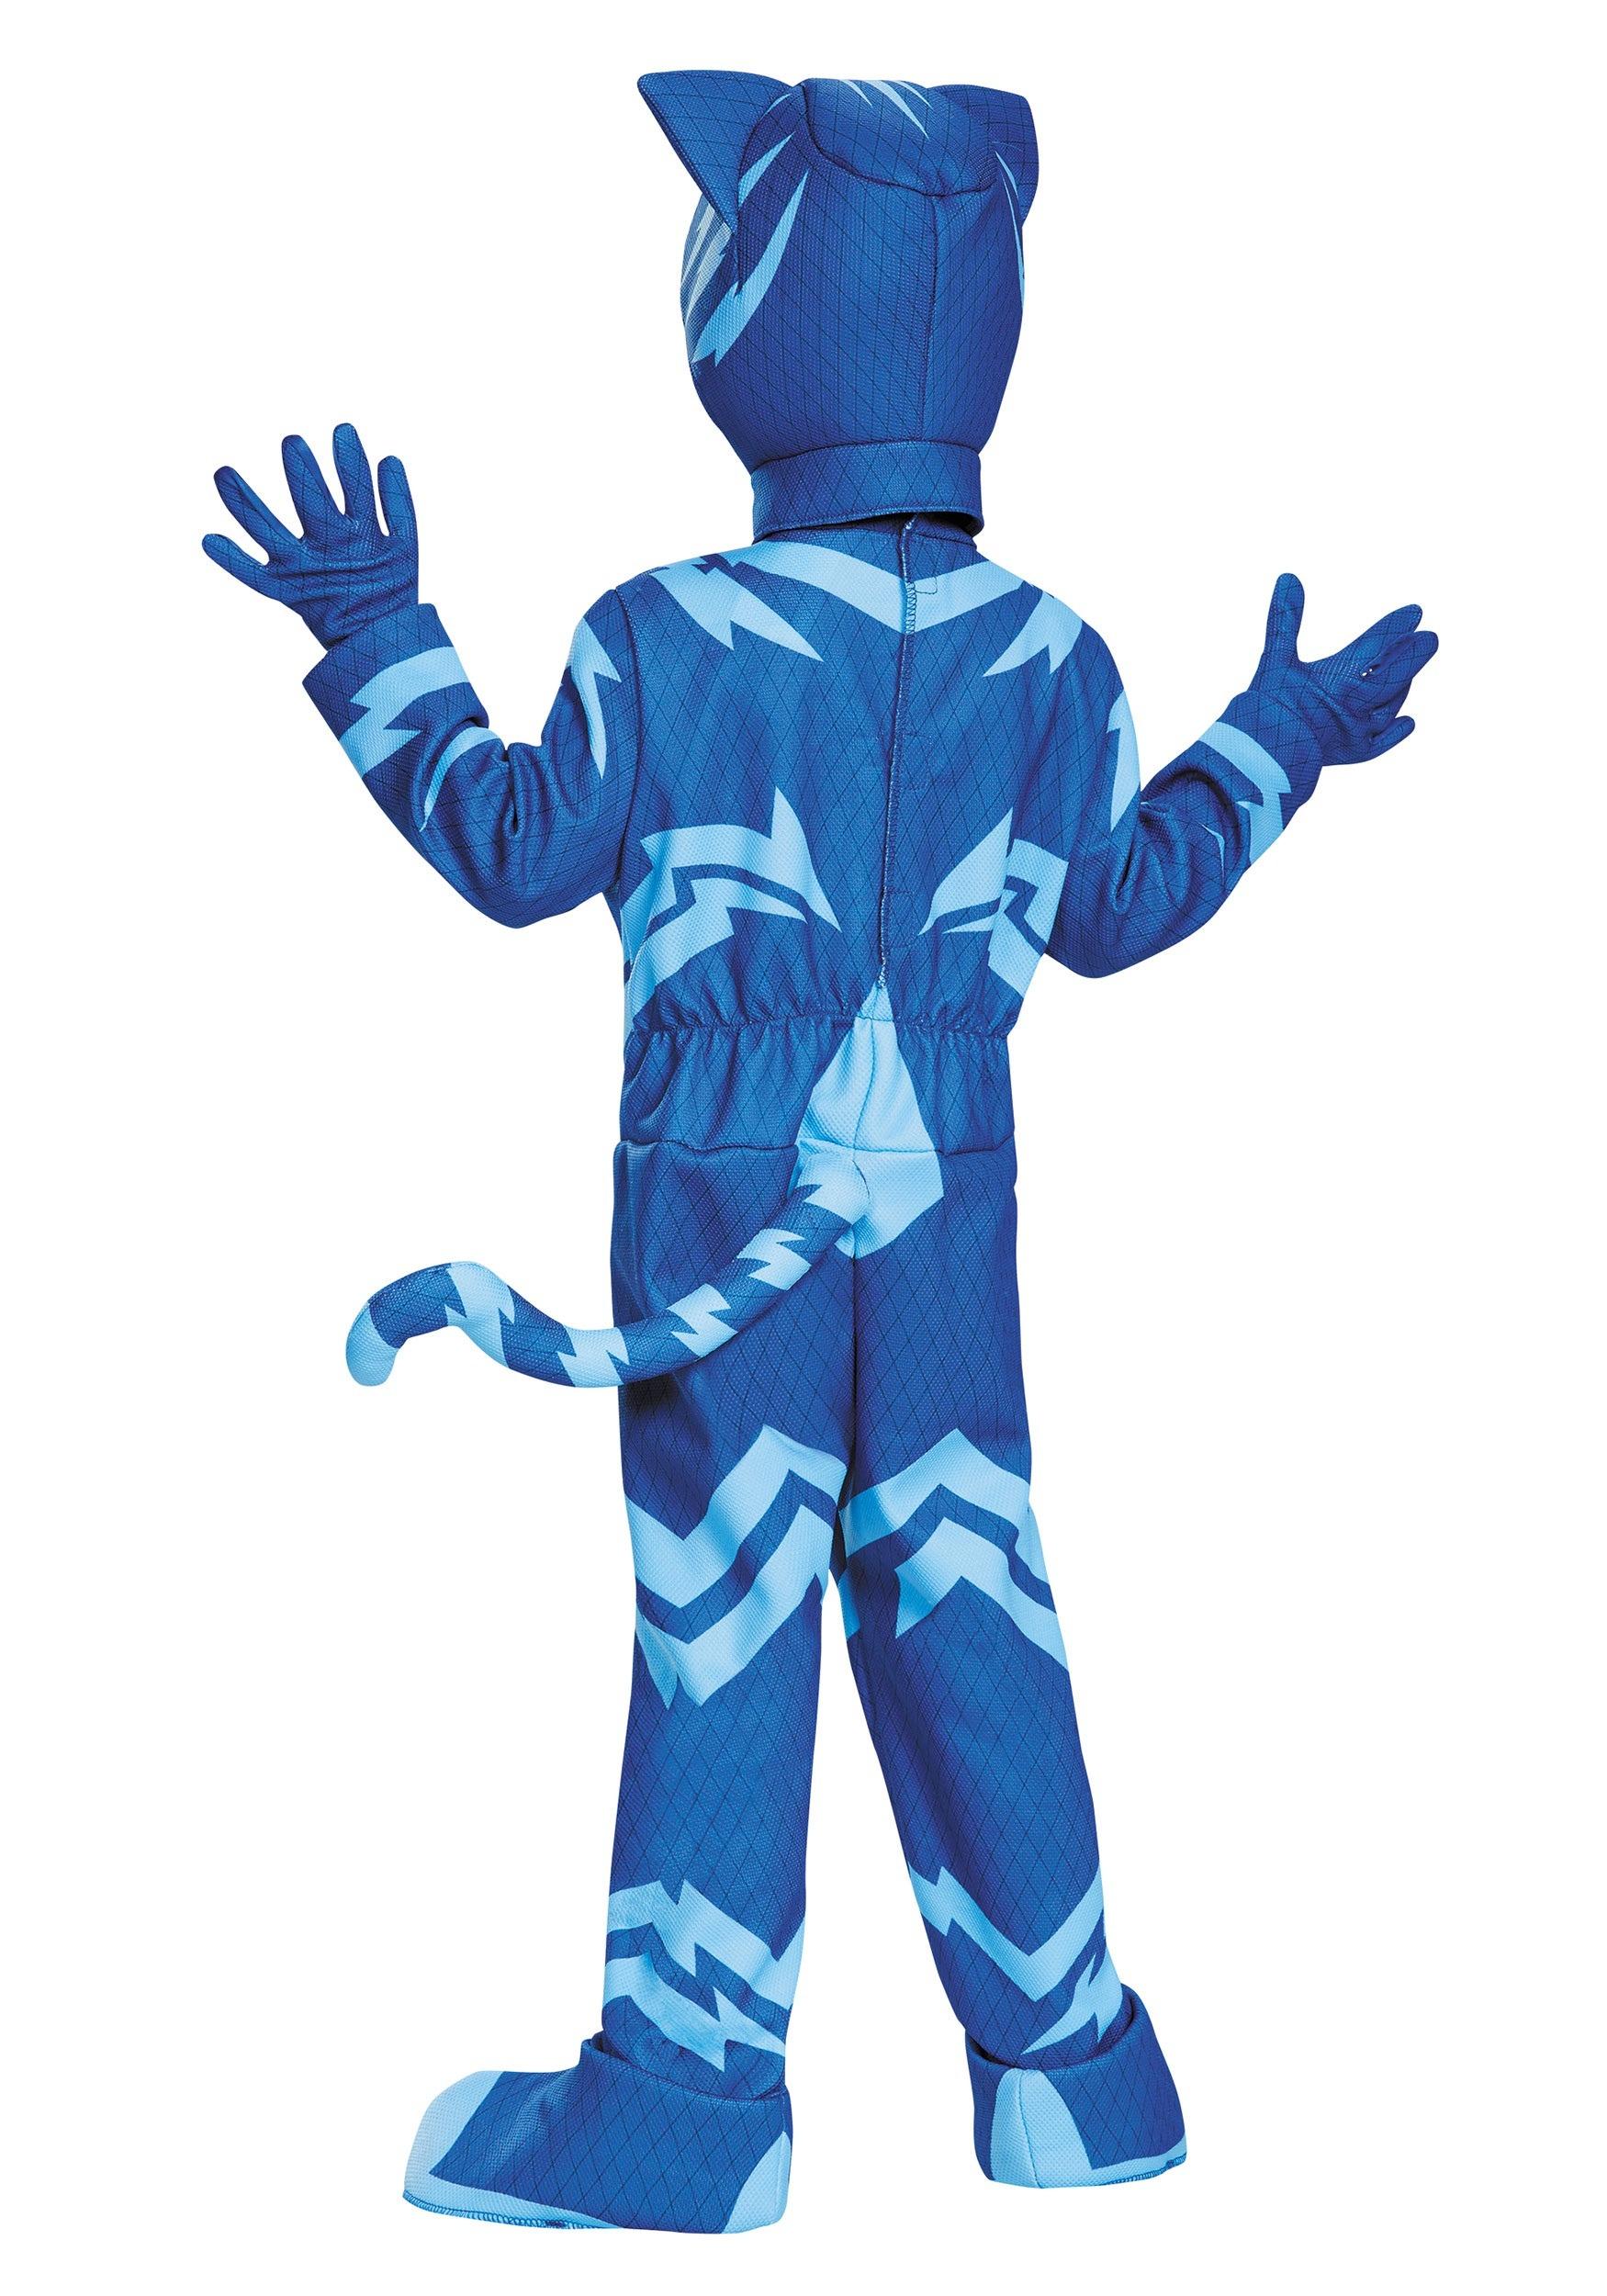 Deluxe PJ Masks Cat Boy Costume Deluxe PJ Masks Cat Boy Costume1 ... a5ad062bd